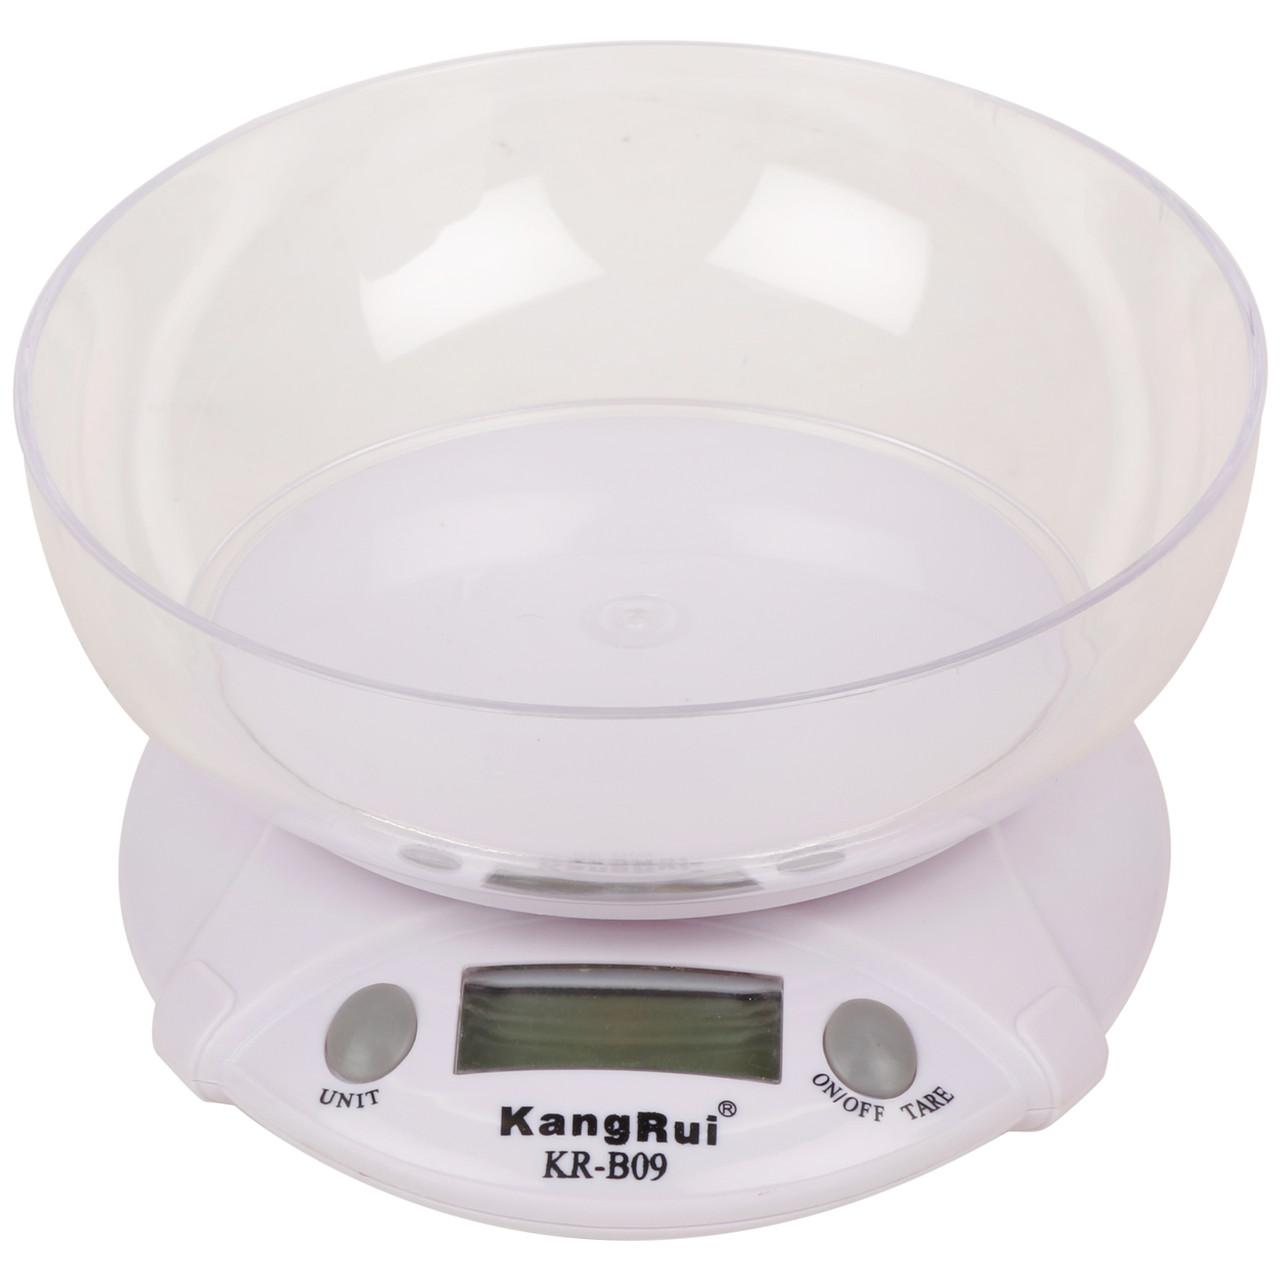 Весы кухонные с чашей KangRui KR-B05